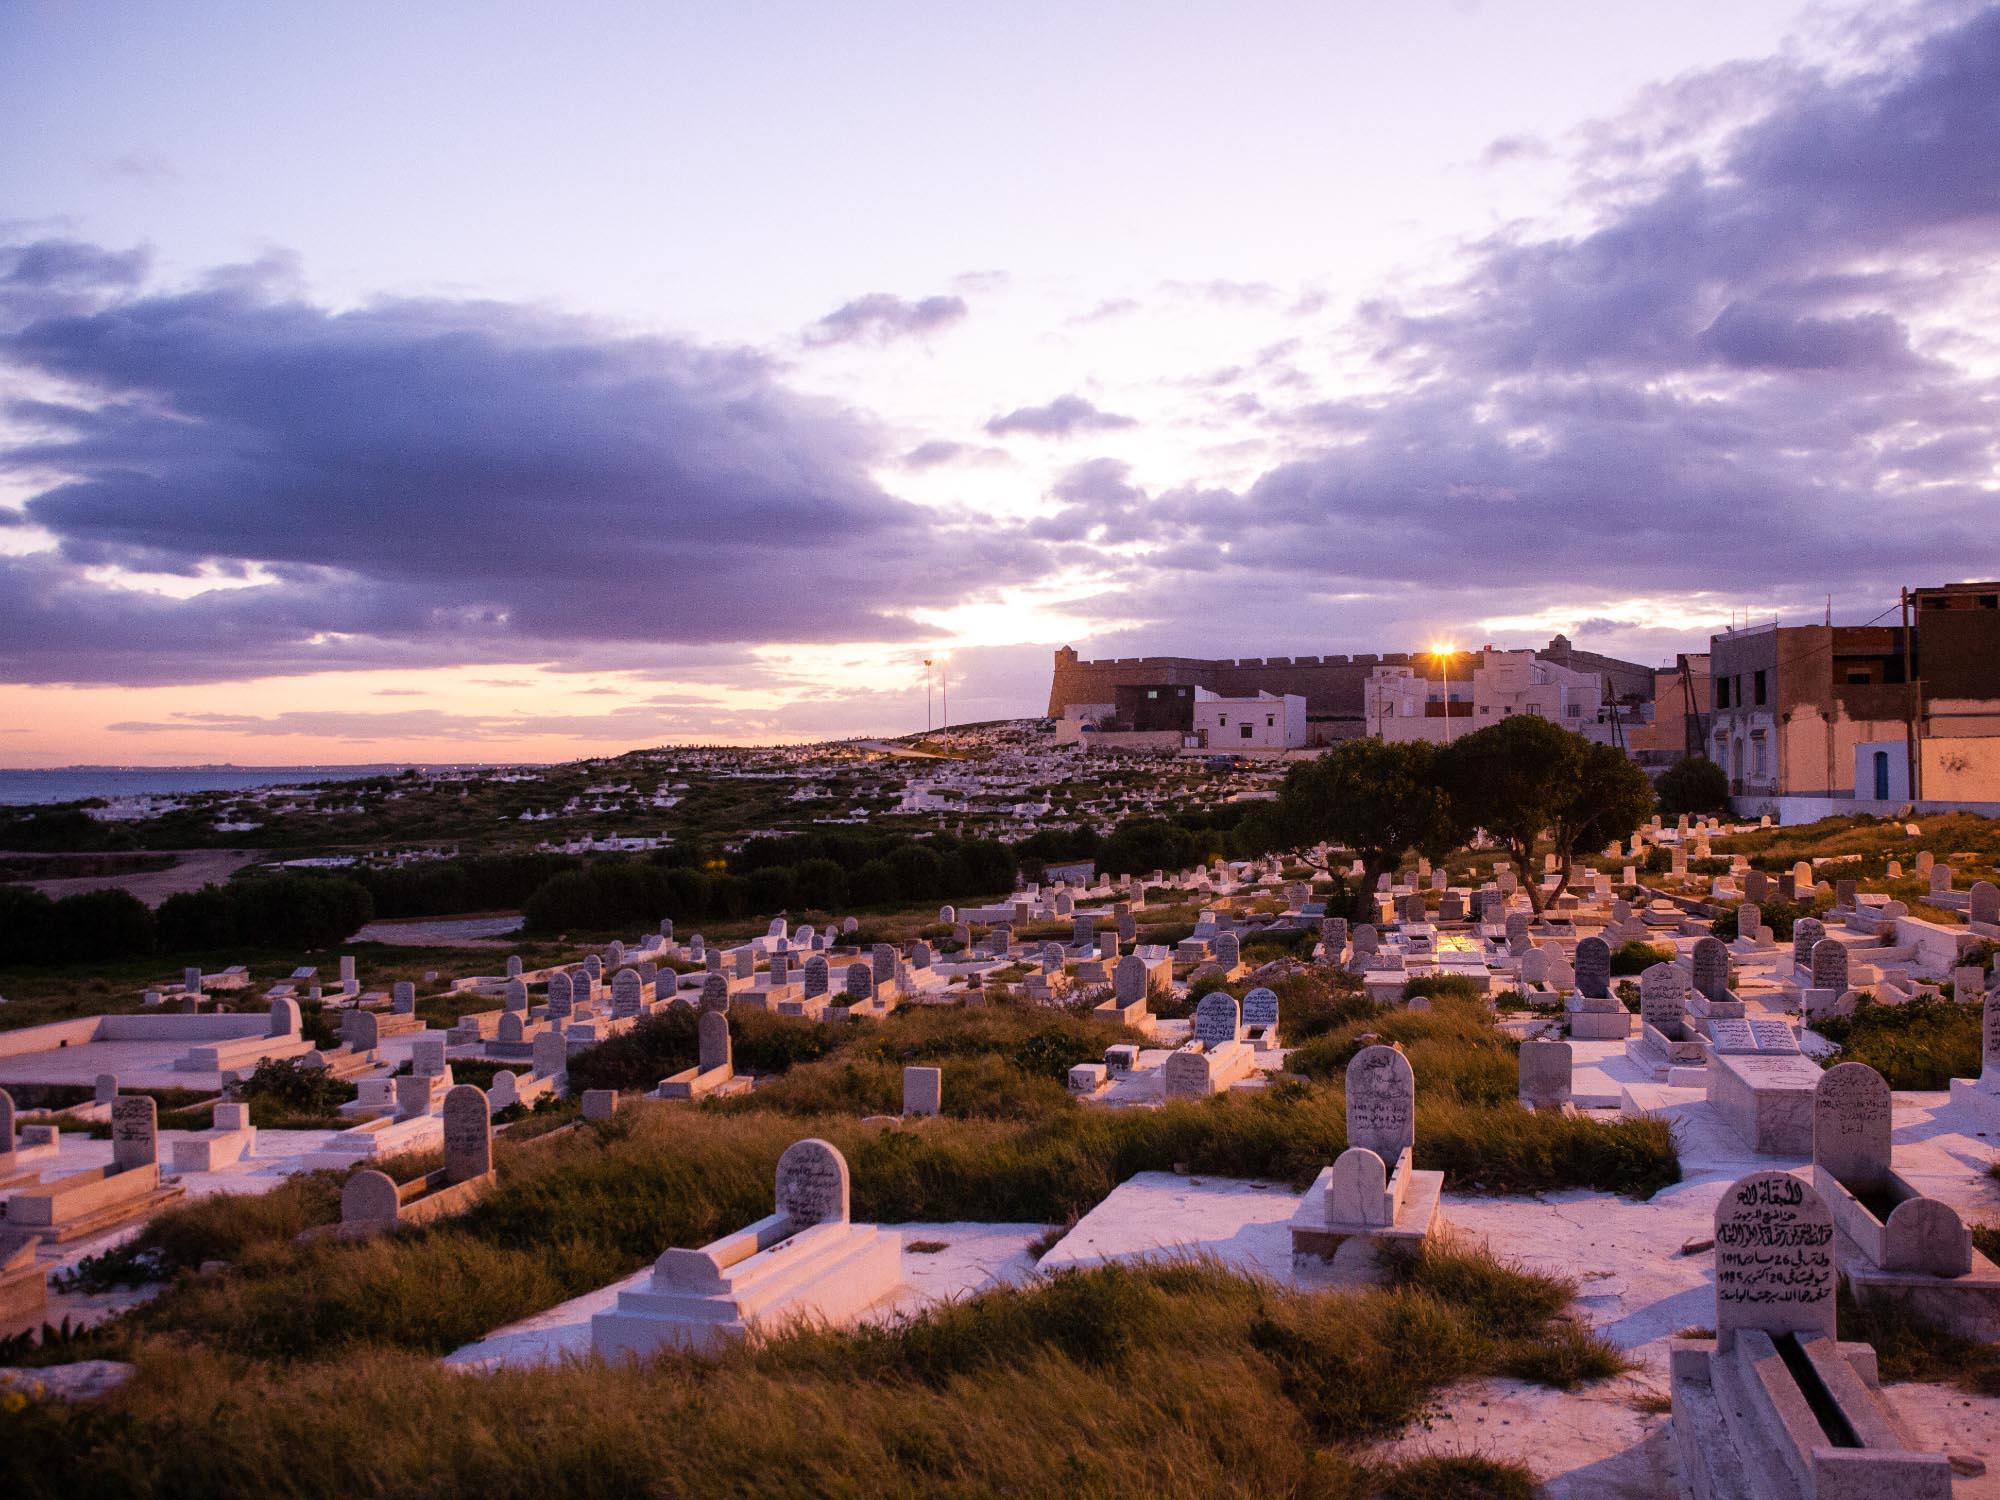 35-2012-TUNISIE-TOURISME©AUGUSTIN_LE-GALL_HAYTHAM-PICTURES-13-PATRIMOINE-TUNISIE©AUGUSTIN-LEGALL-_MG_3717.jpg